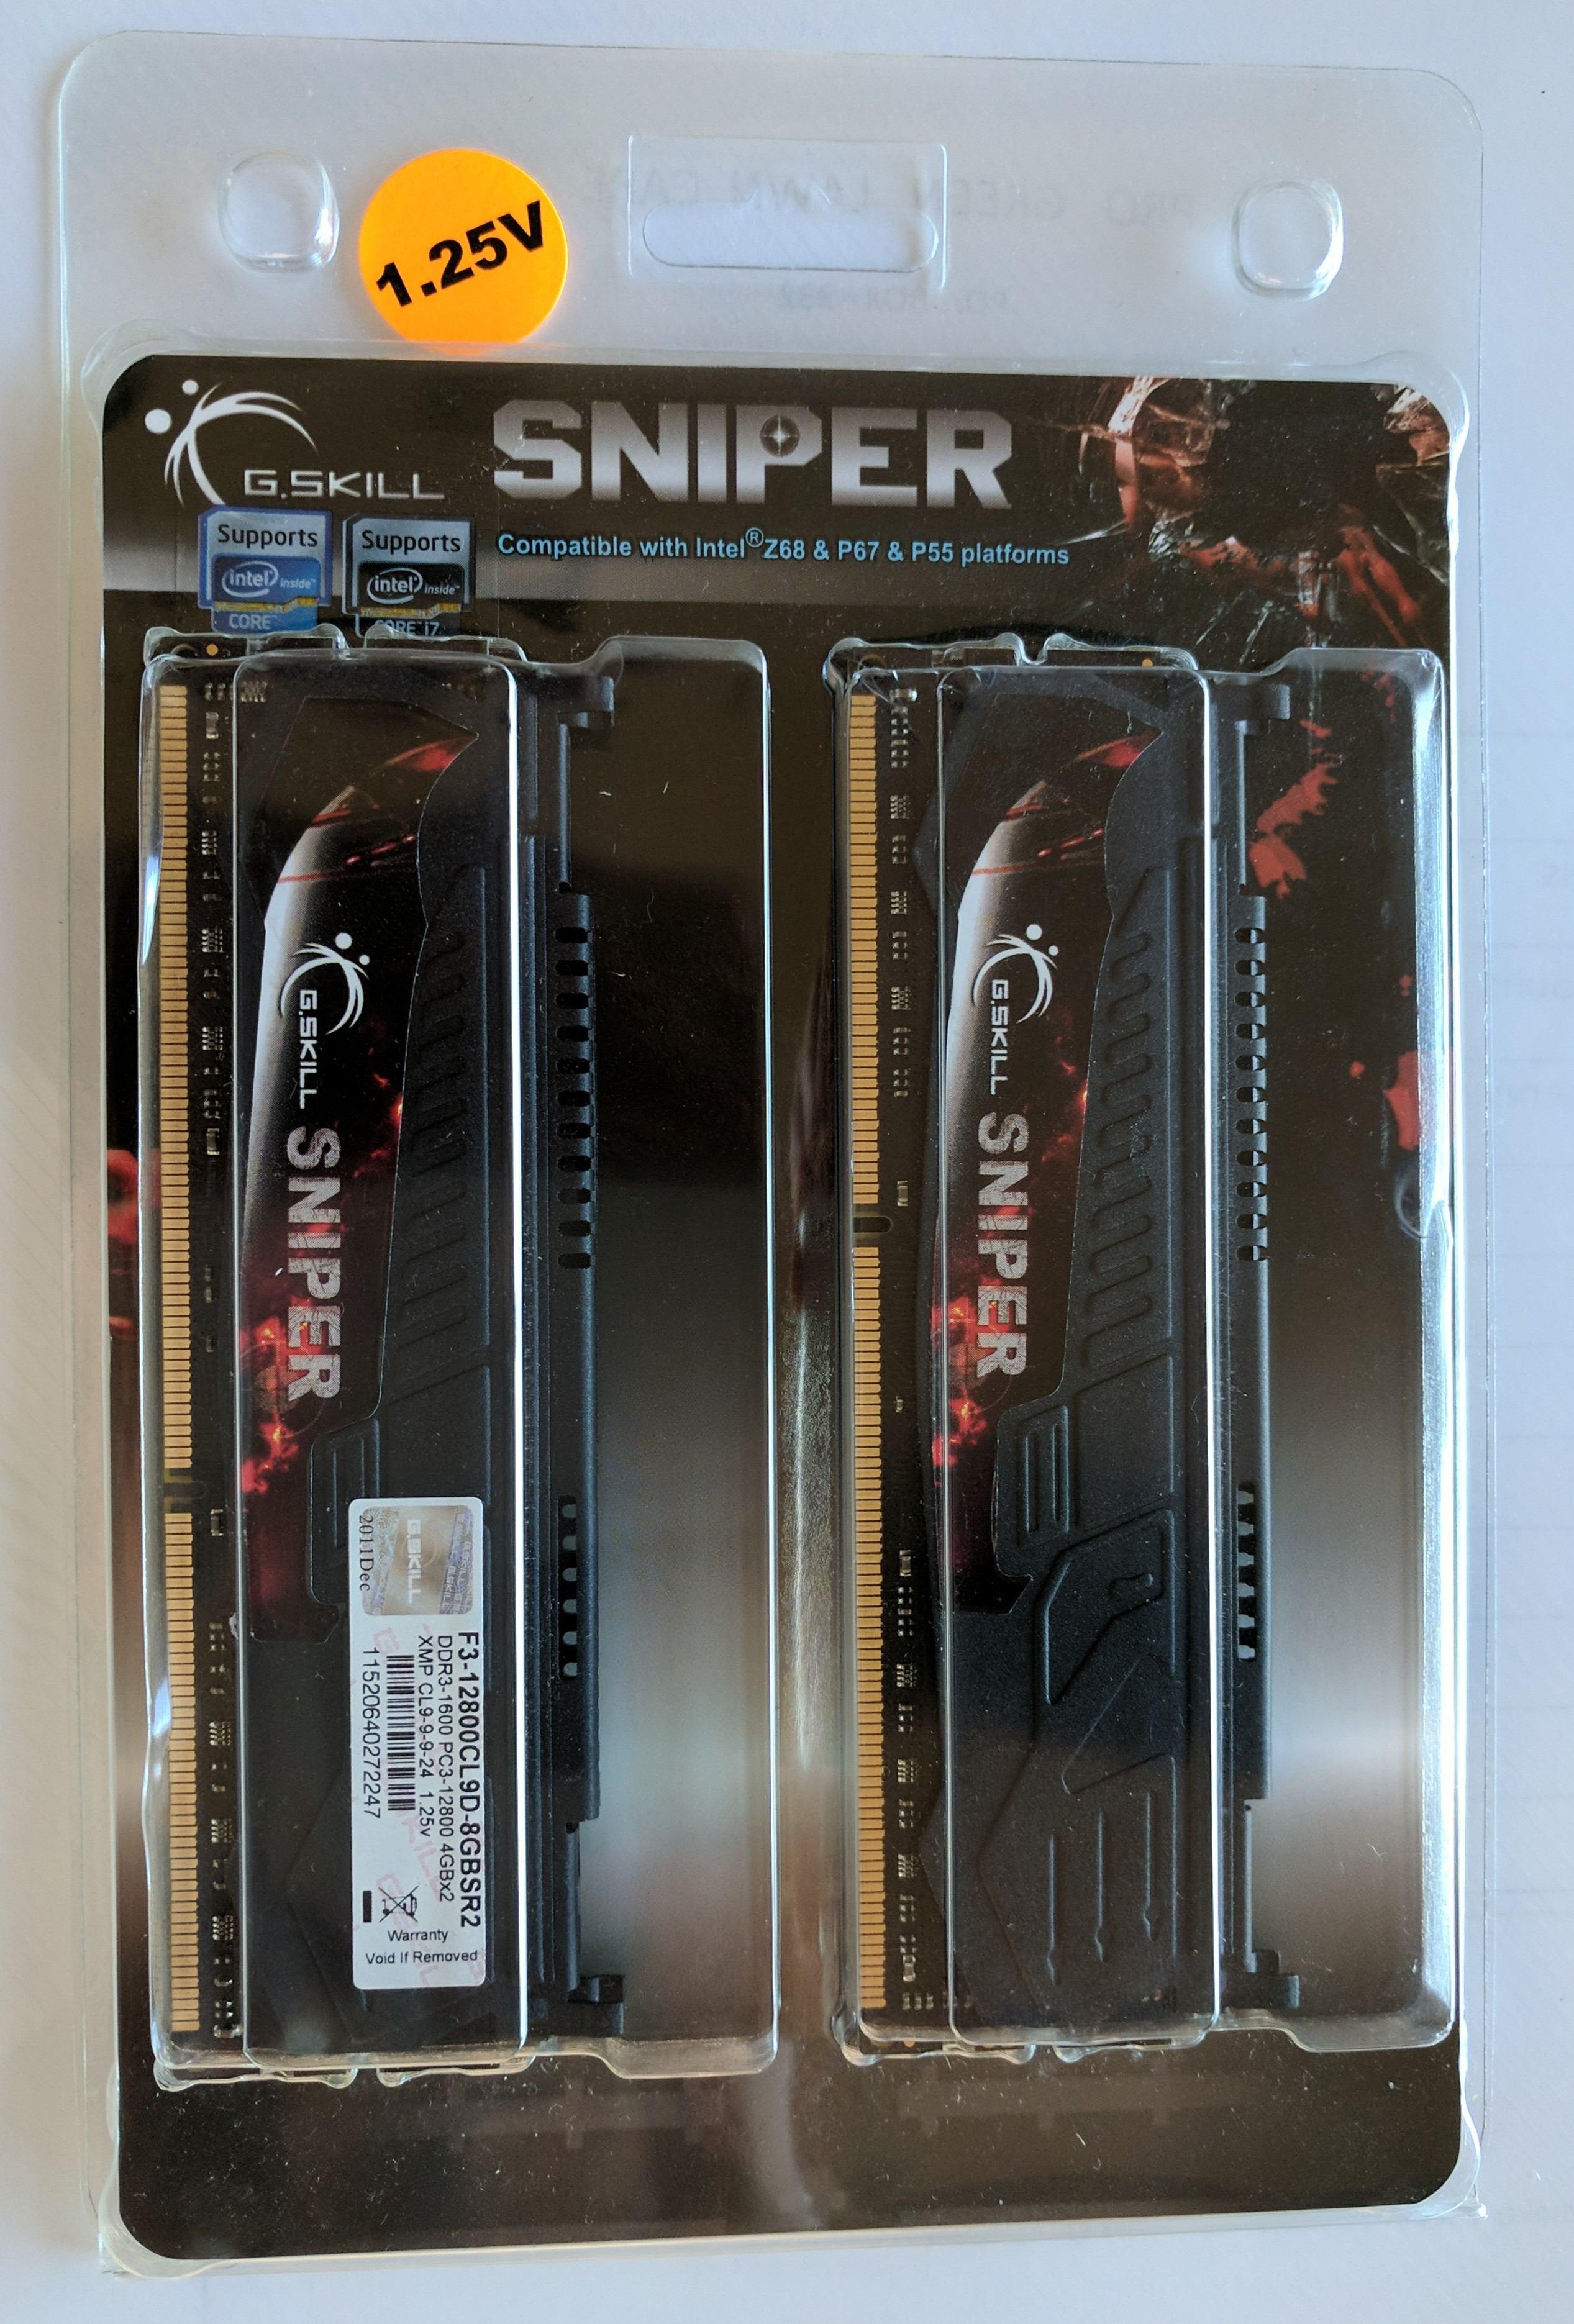 G Skill Sniper 8GB (2x4GB) DDR3-1600 low-voltage 1 25V kit